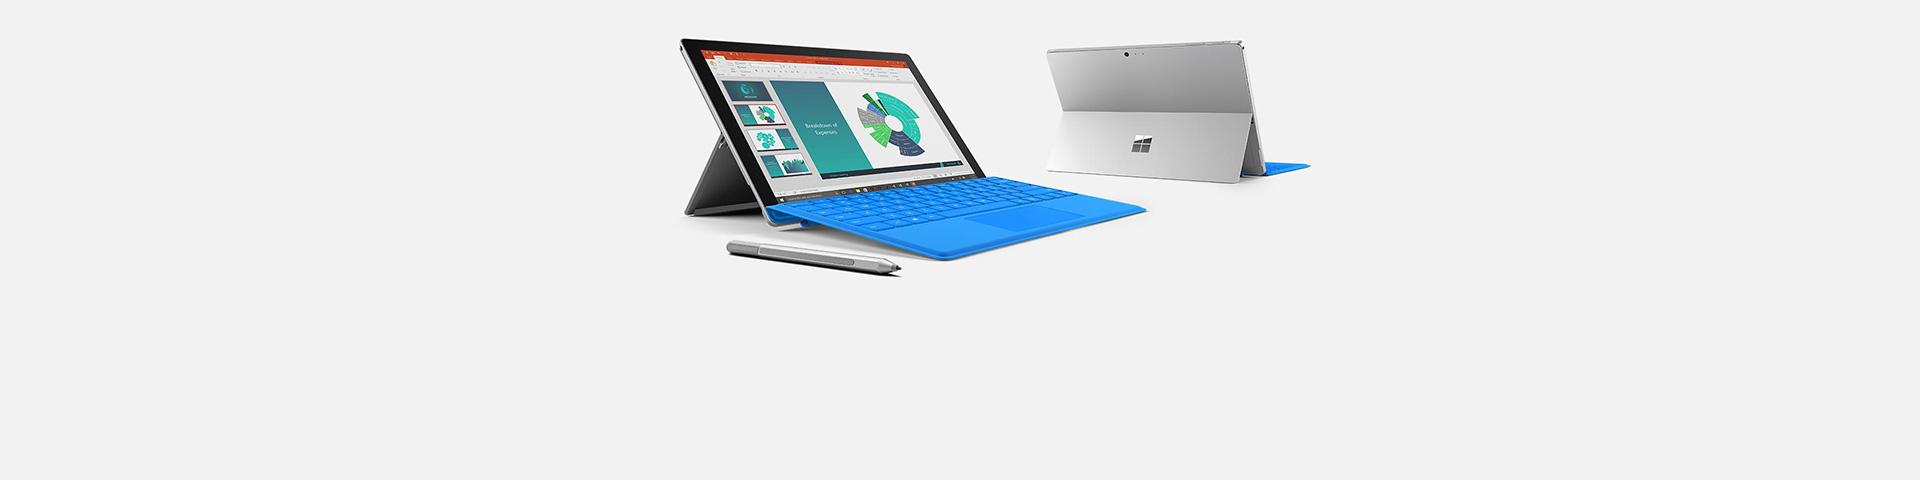 Obtén información sobre los dispositivos Surface Pro 4